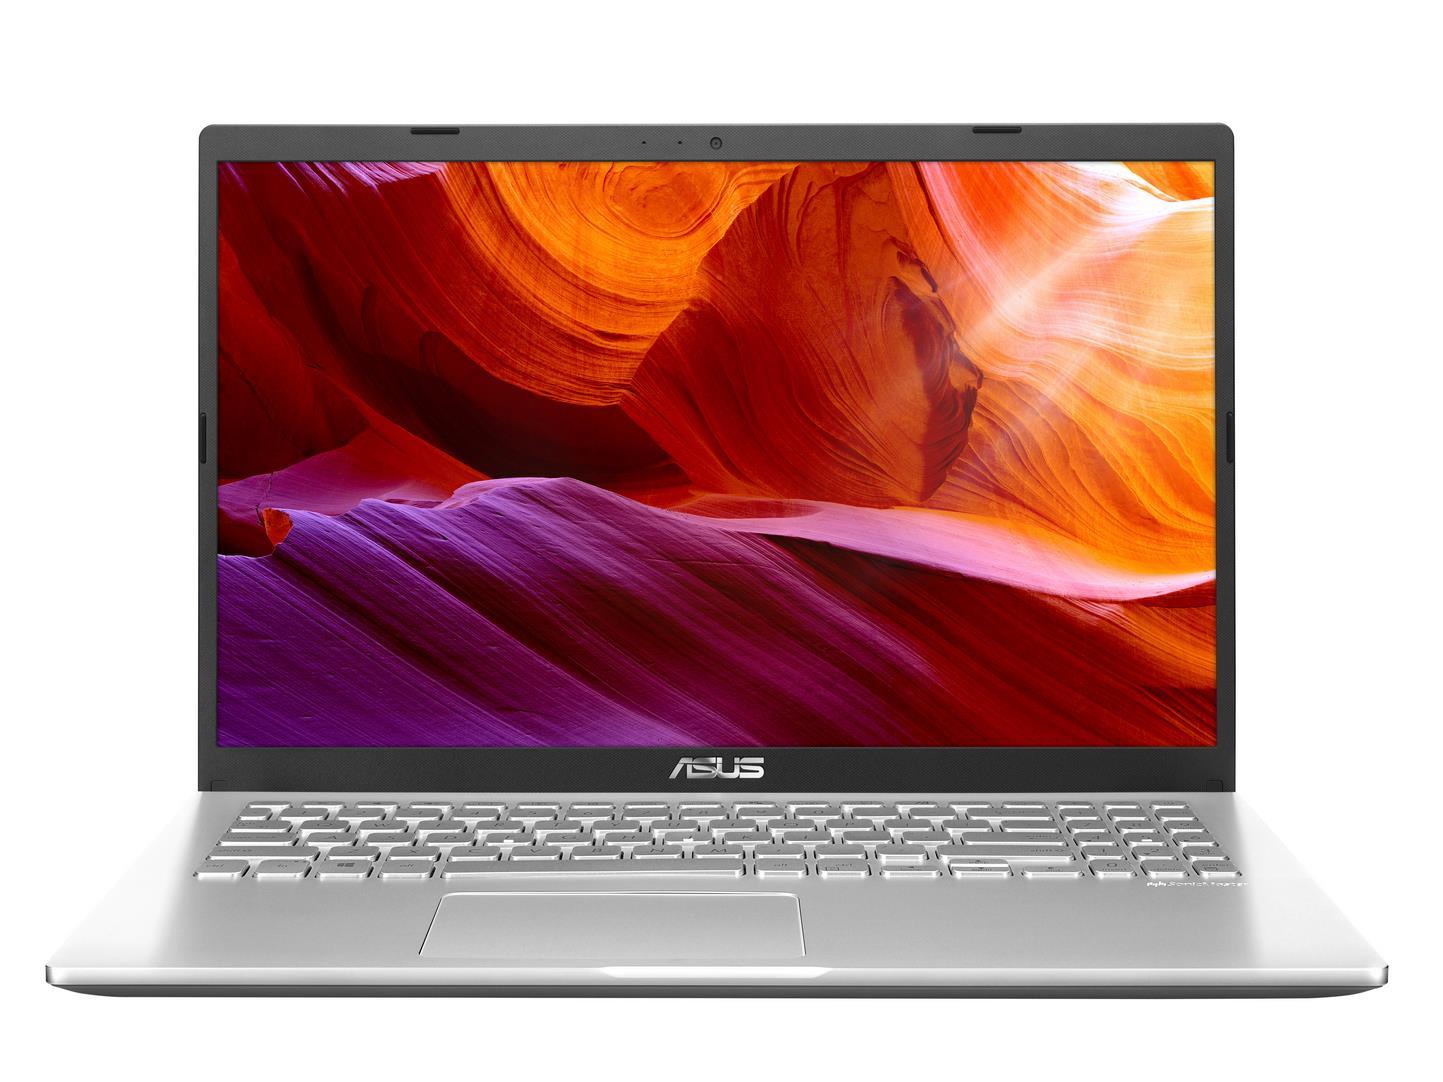 "ASUS M509DA-EJ034T AMD R5-3500U/8GB/256GB SSD/15,6"" FHD/Win10/stříbrný"